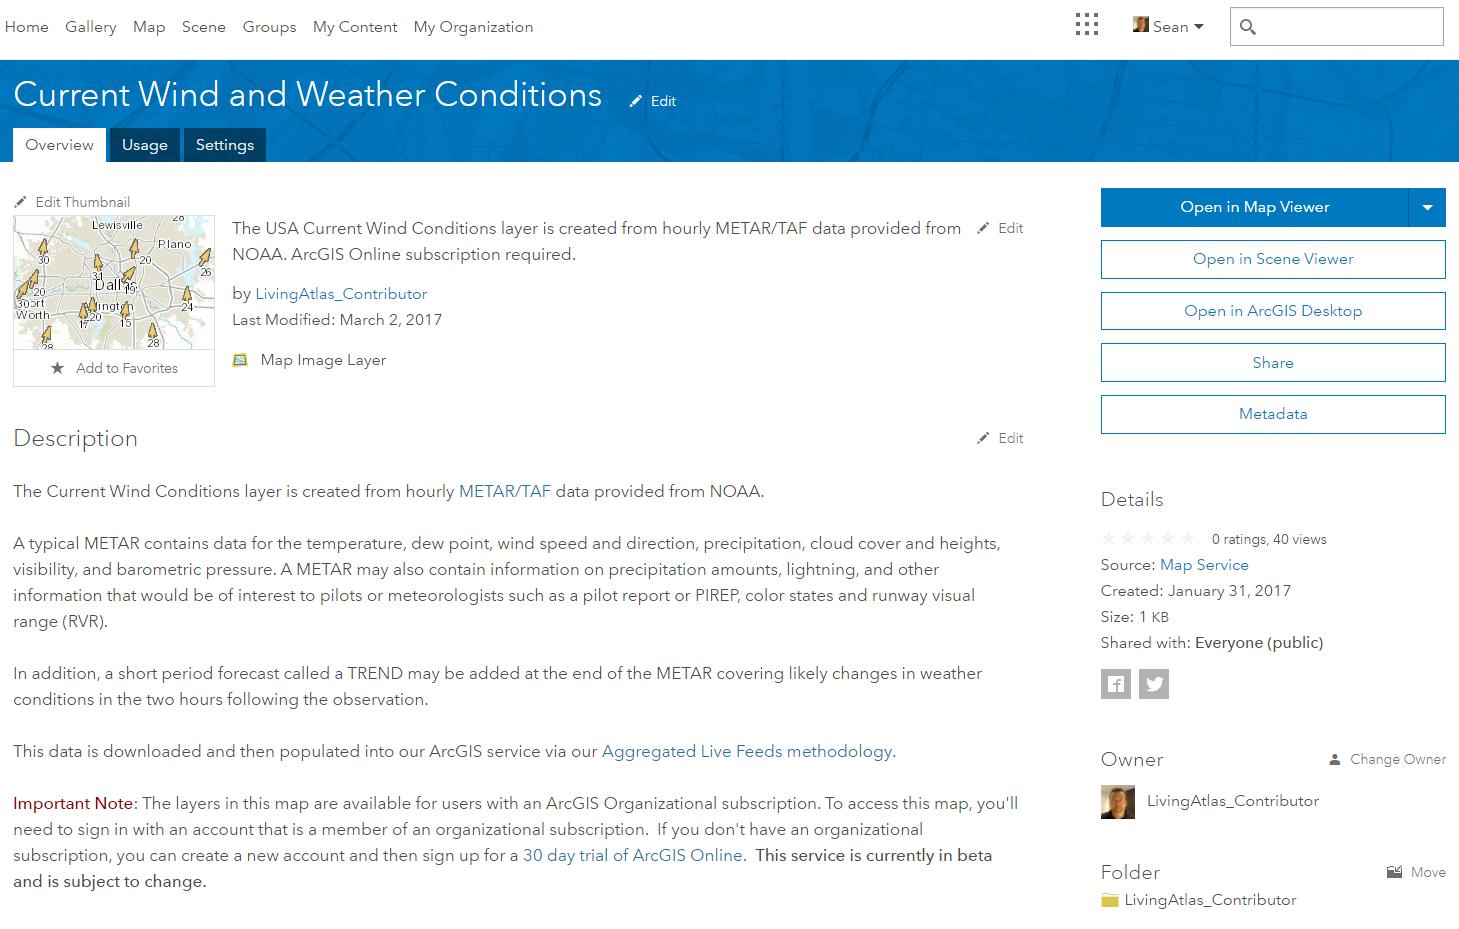 ArcGIS Online Item Details page